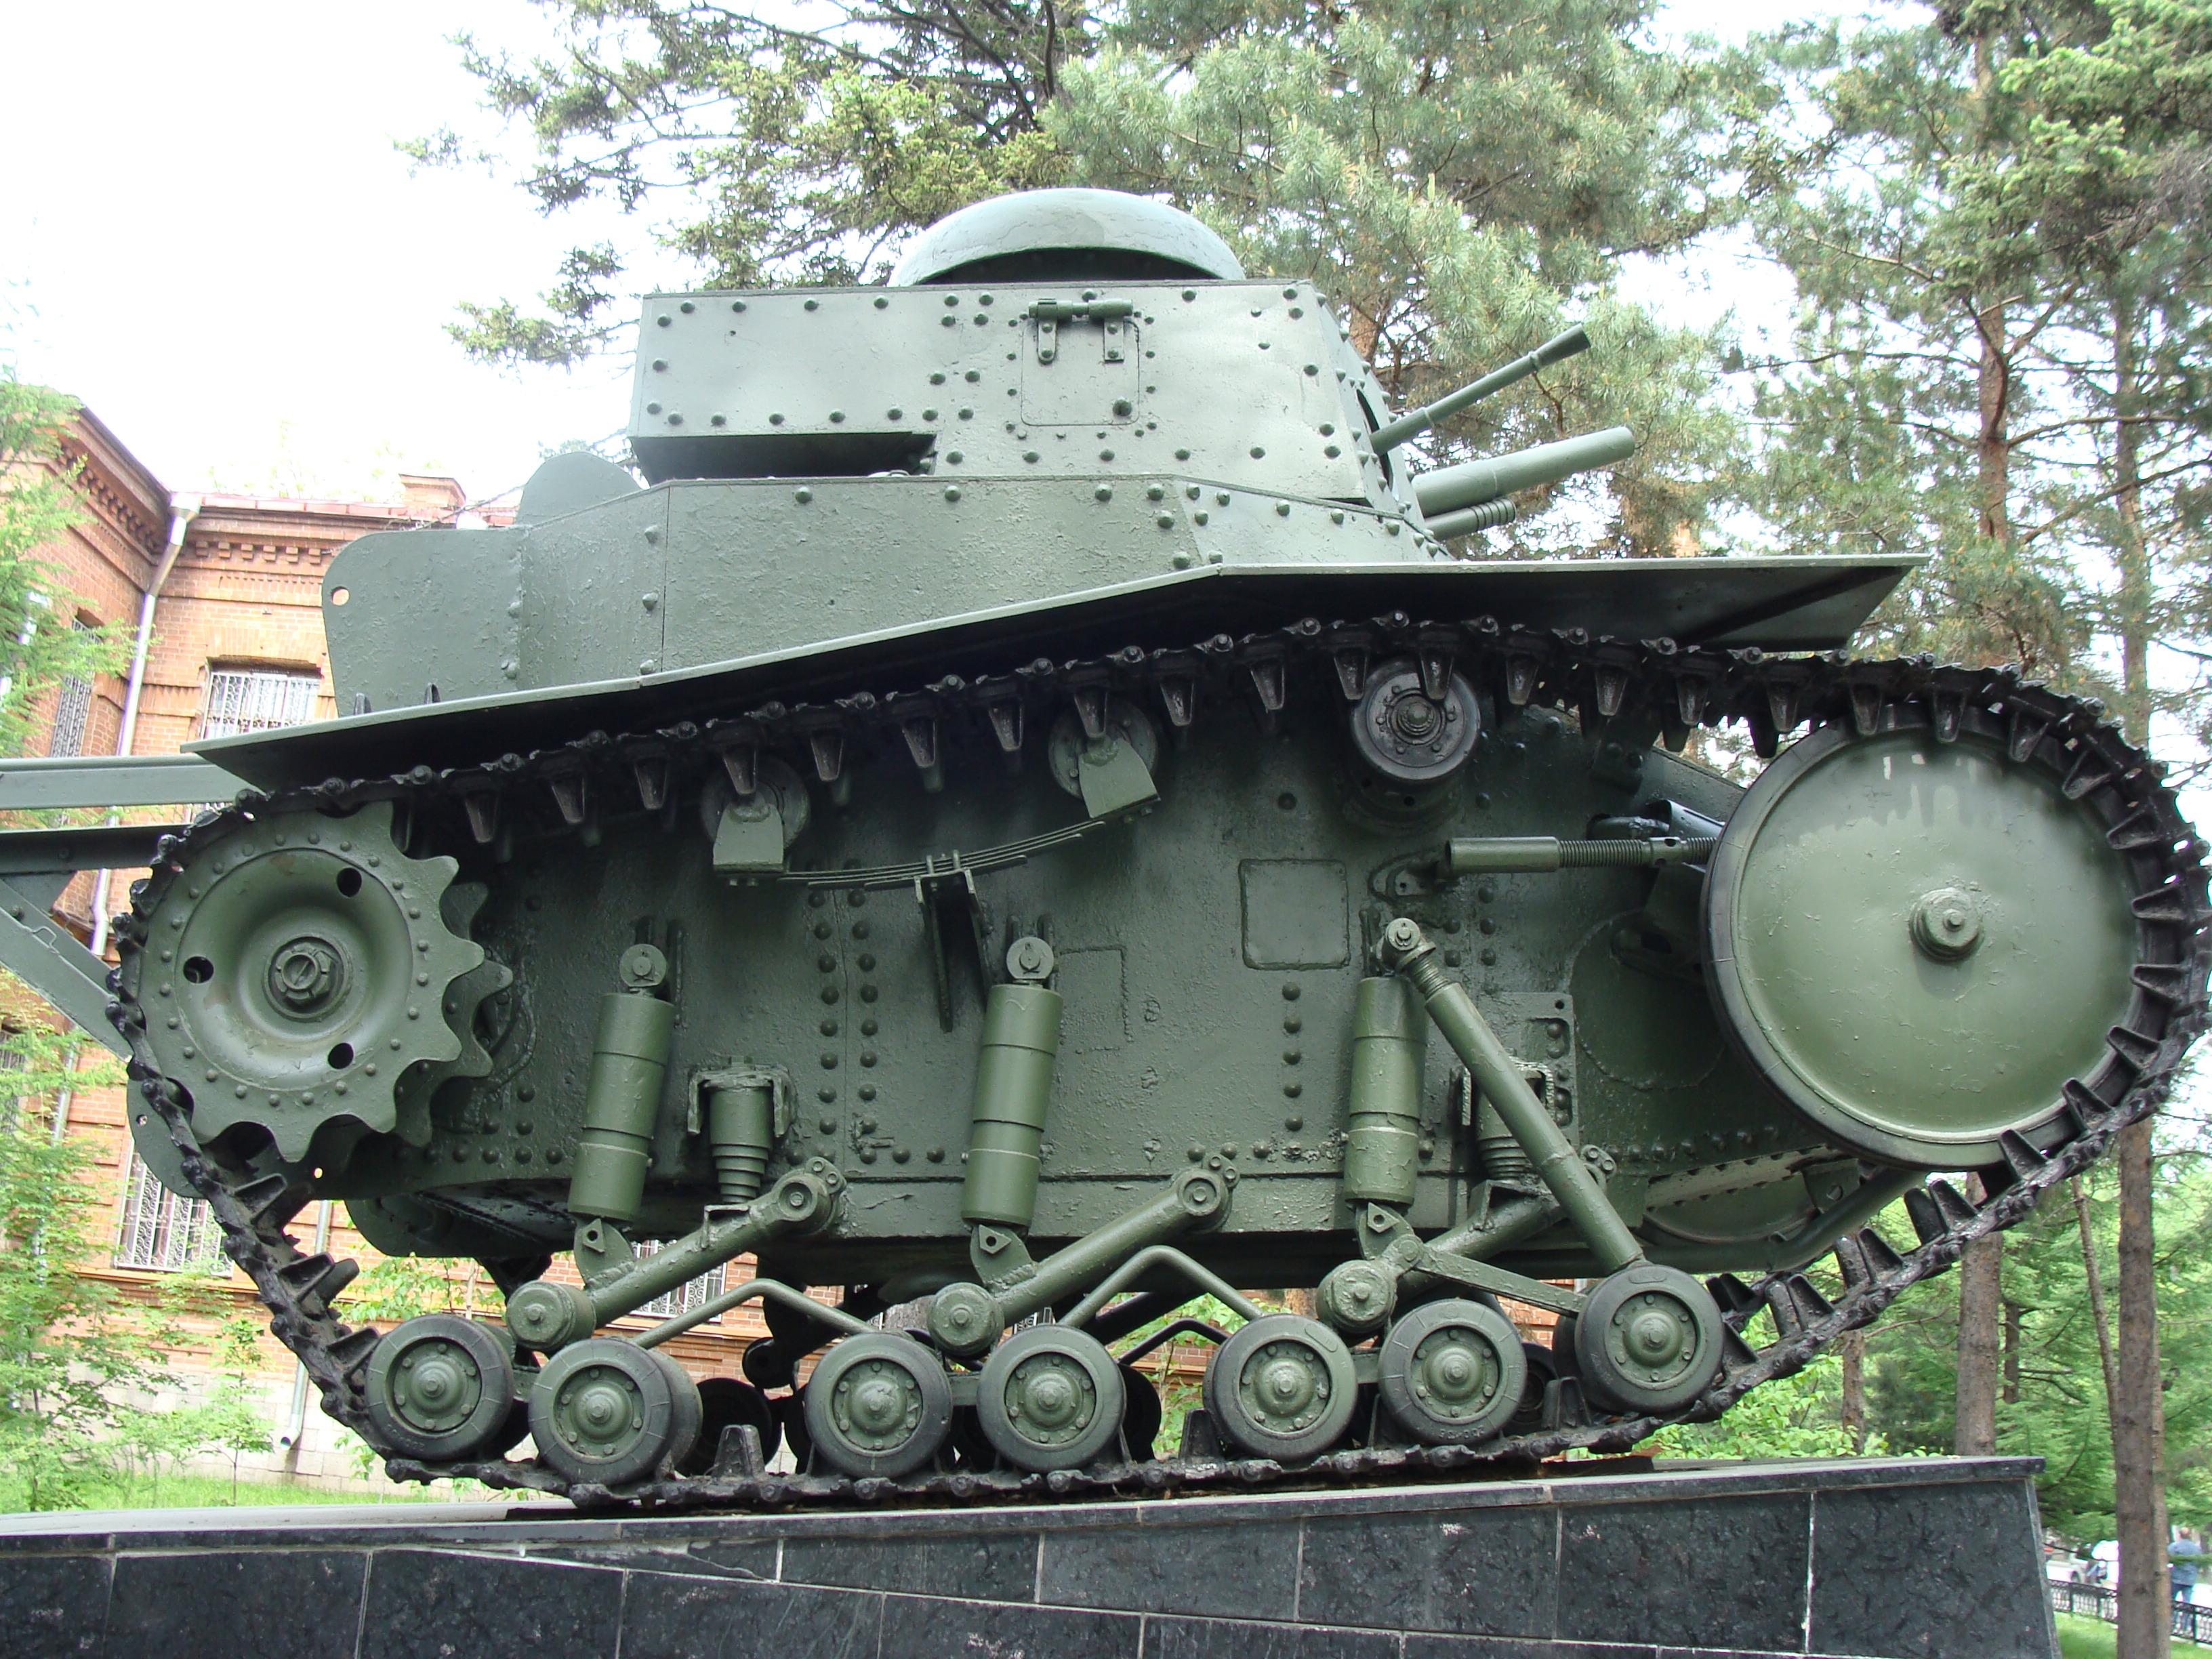 File:Т-18 Хабаровск вид с боку1.jpg - Wikimedia Commons